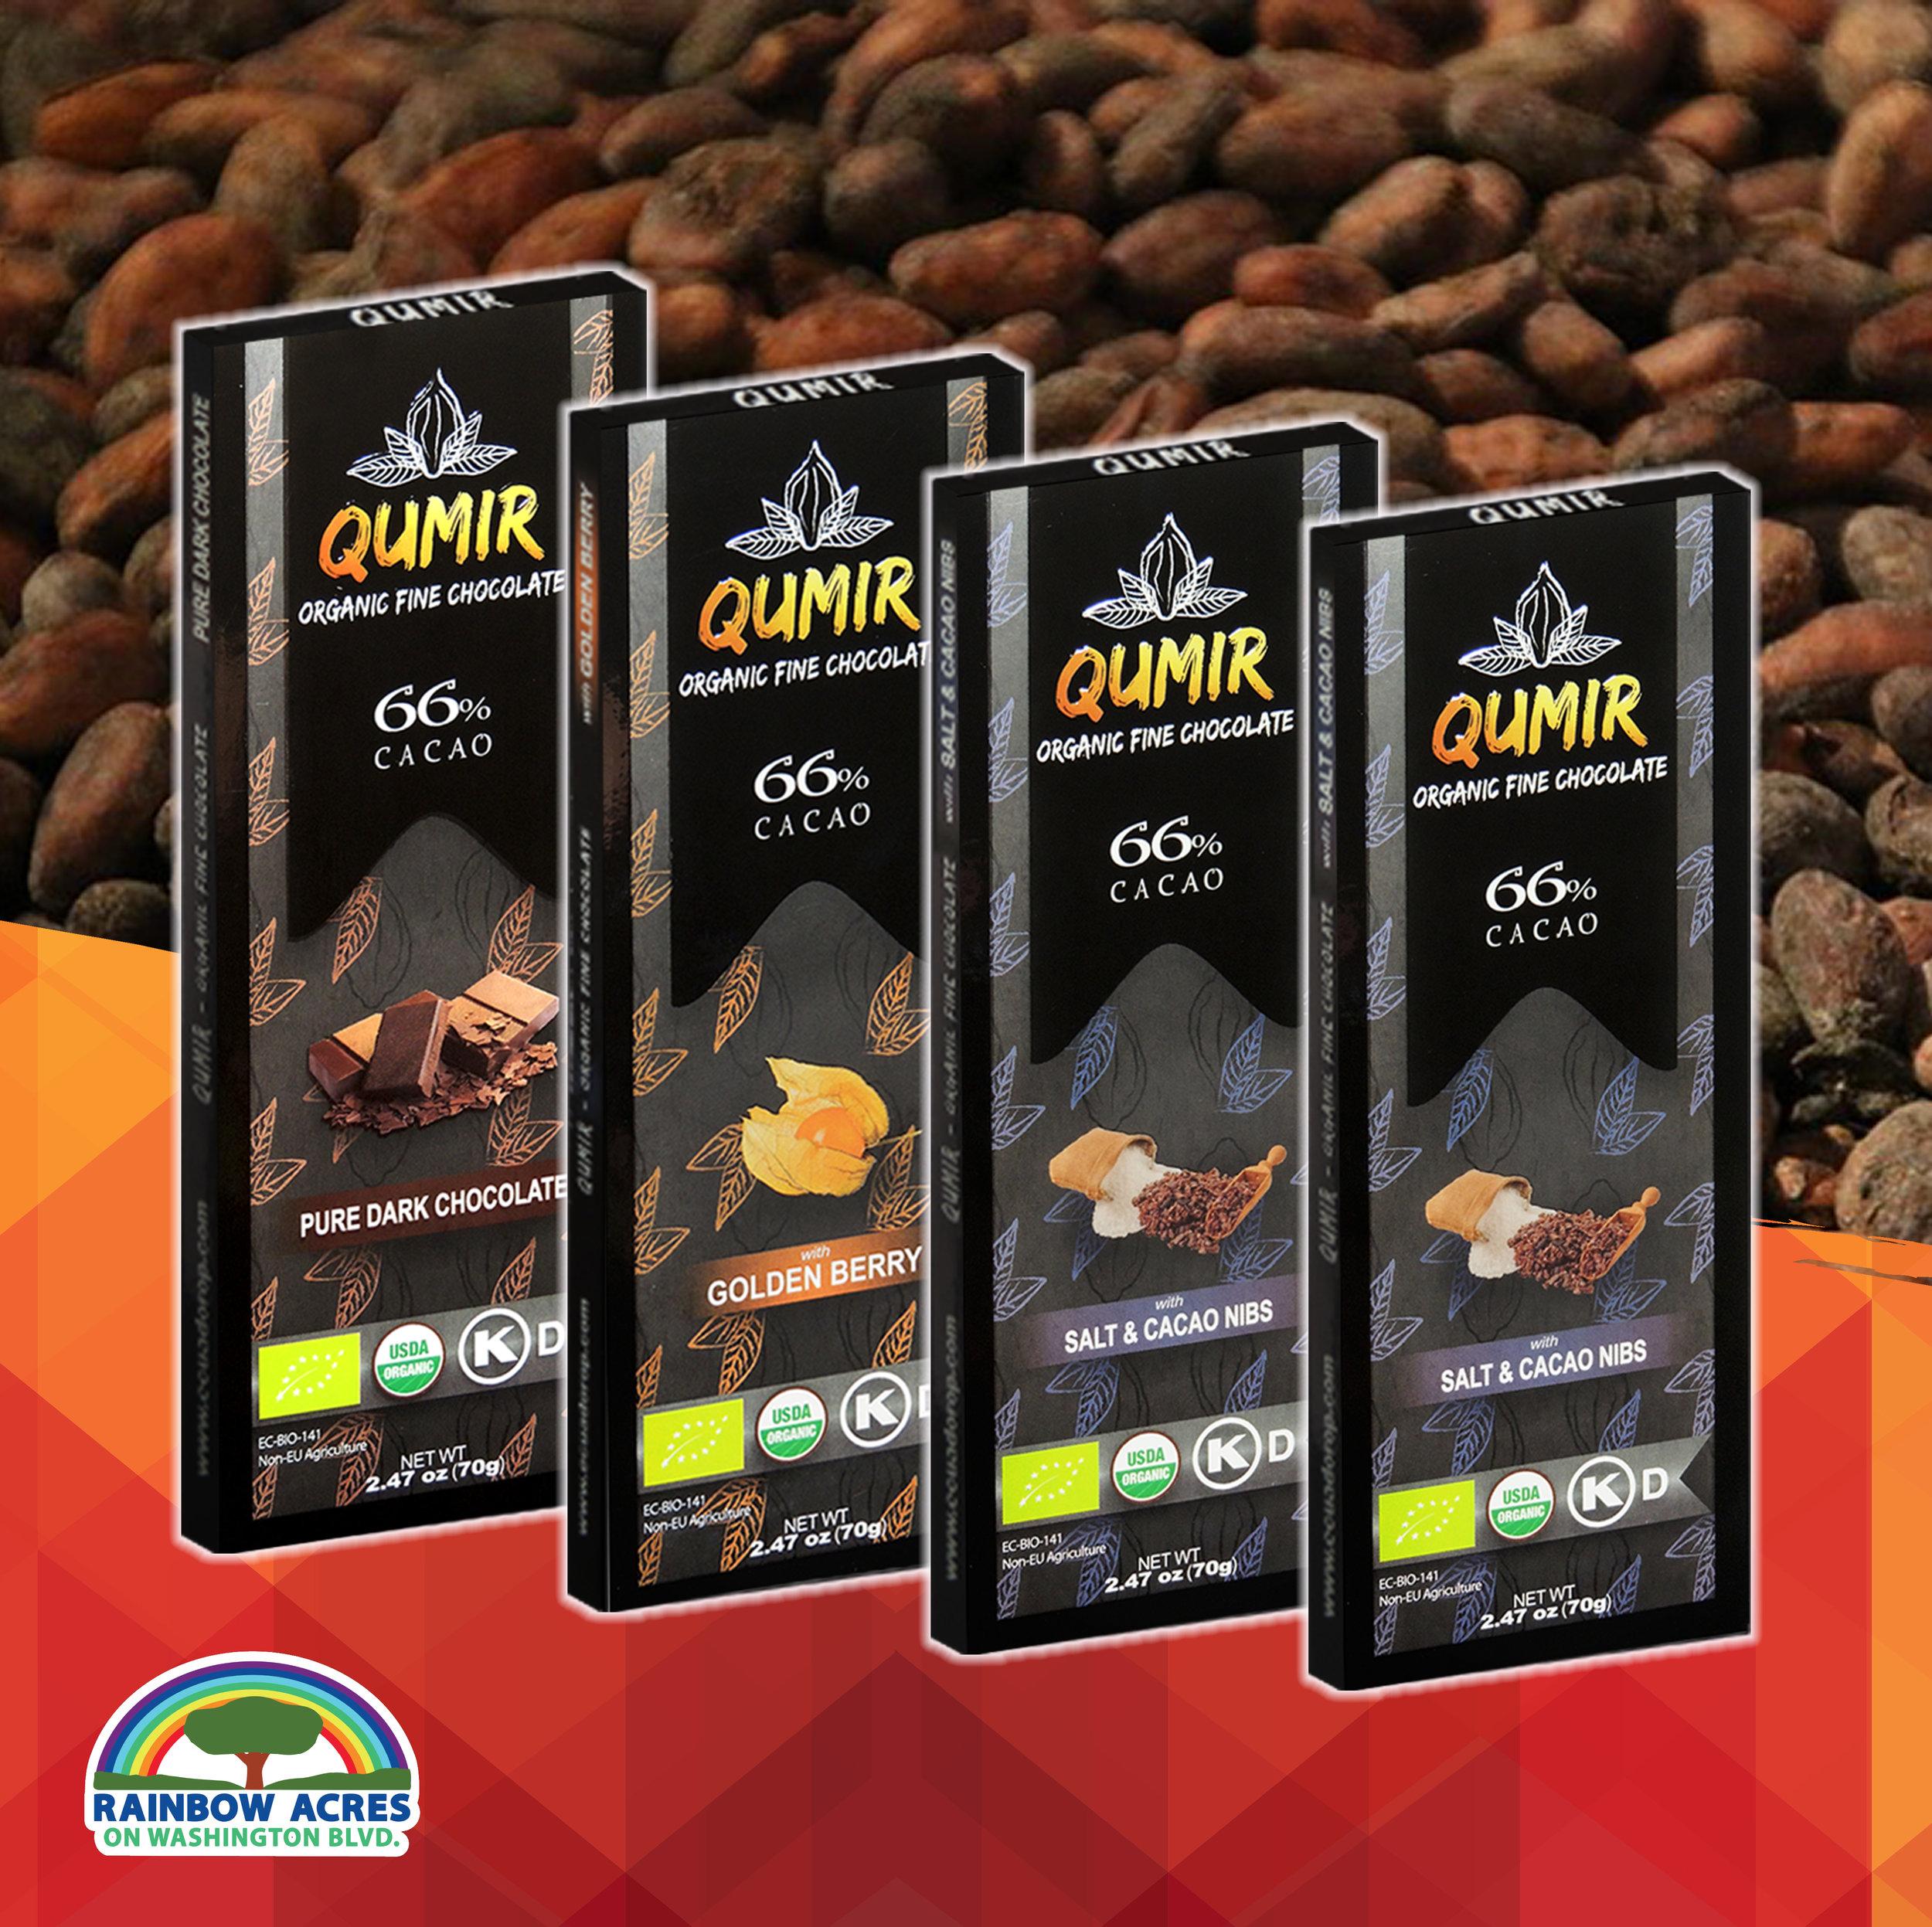 Qumir chocolate post.jpg